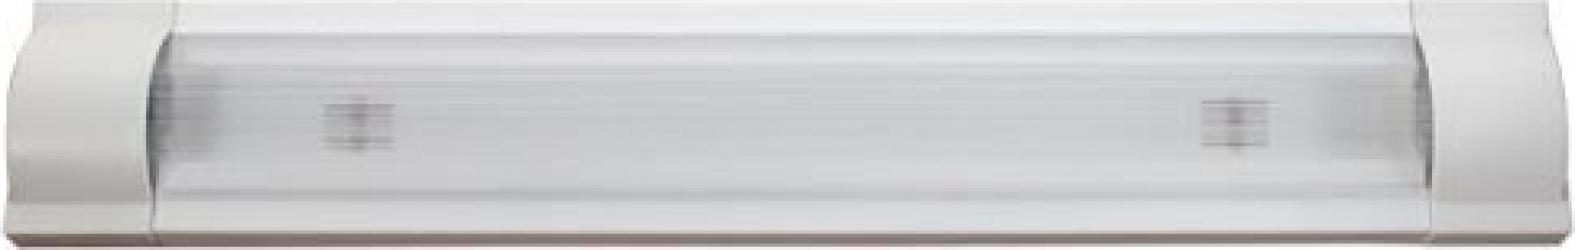 Corp iluminat cu dispersor pentru tub LED 2x9W D 40075 - D3R2-30011